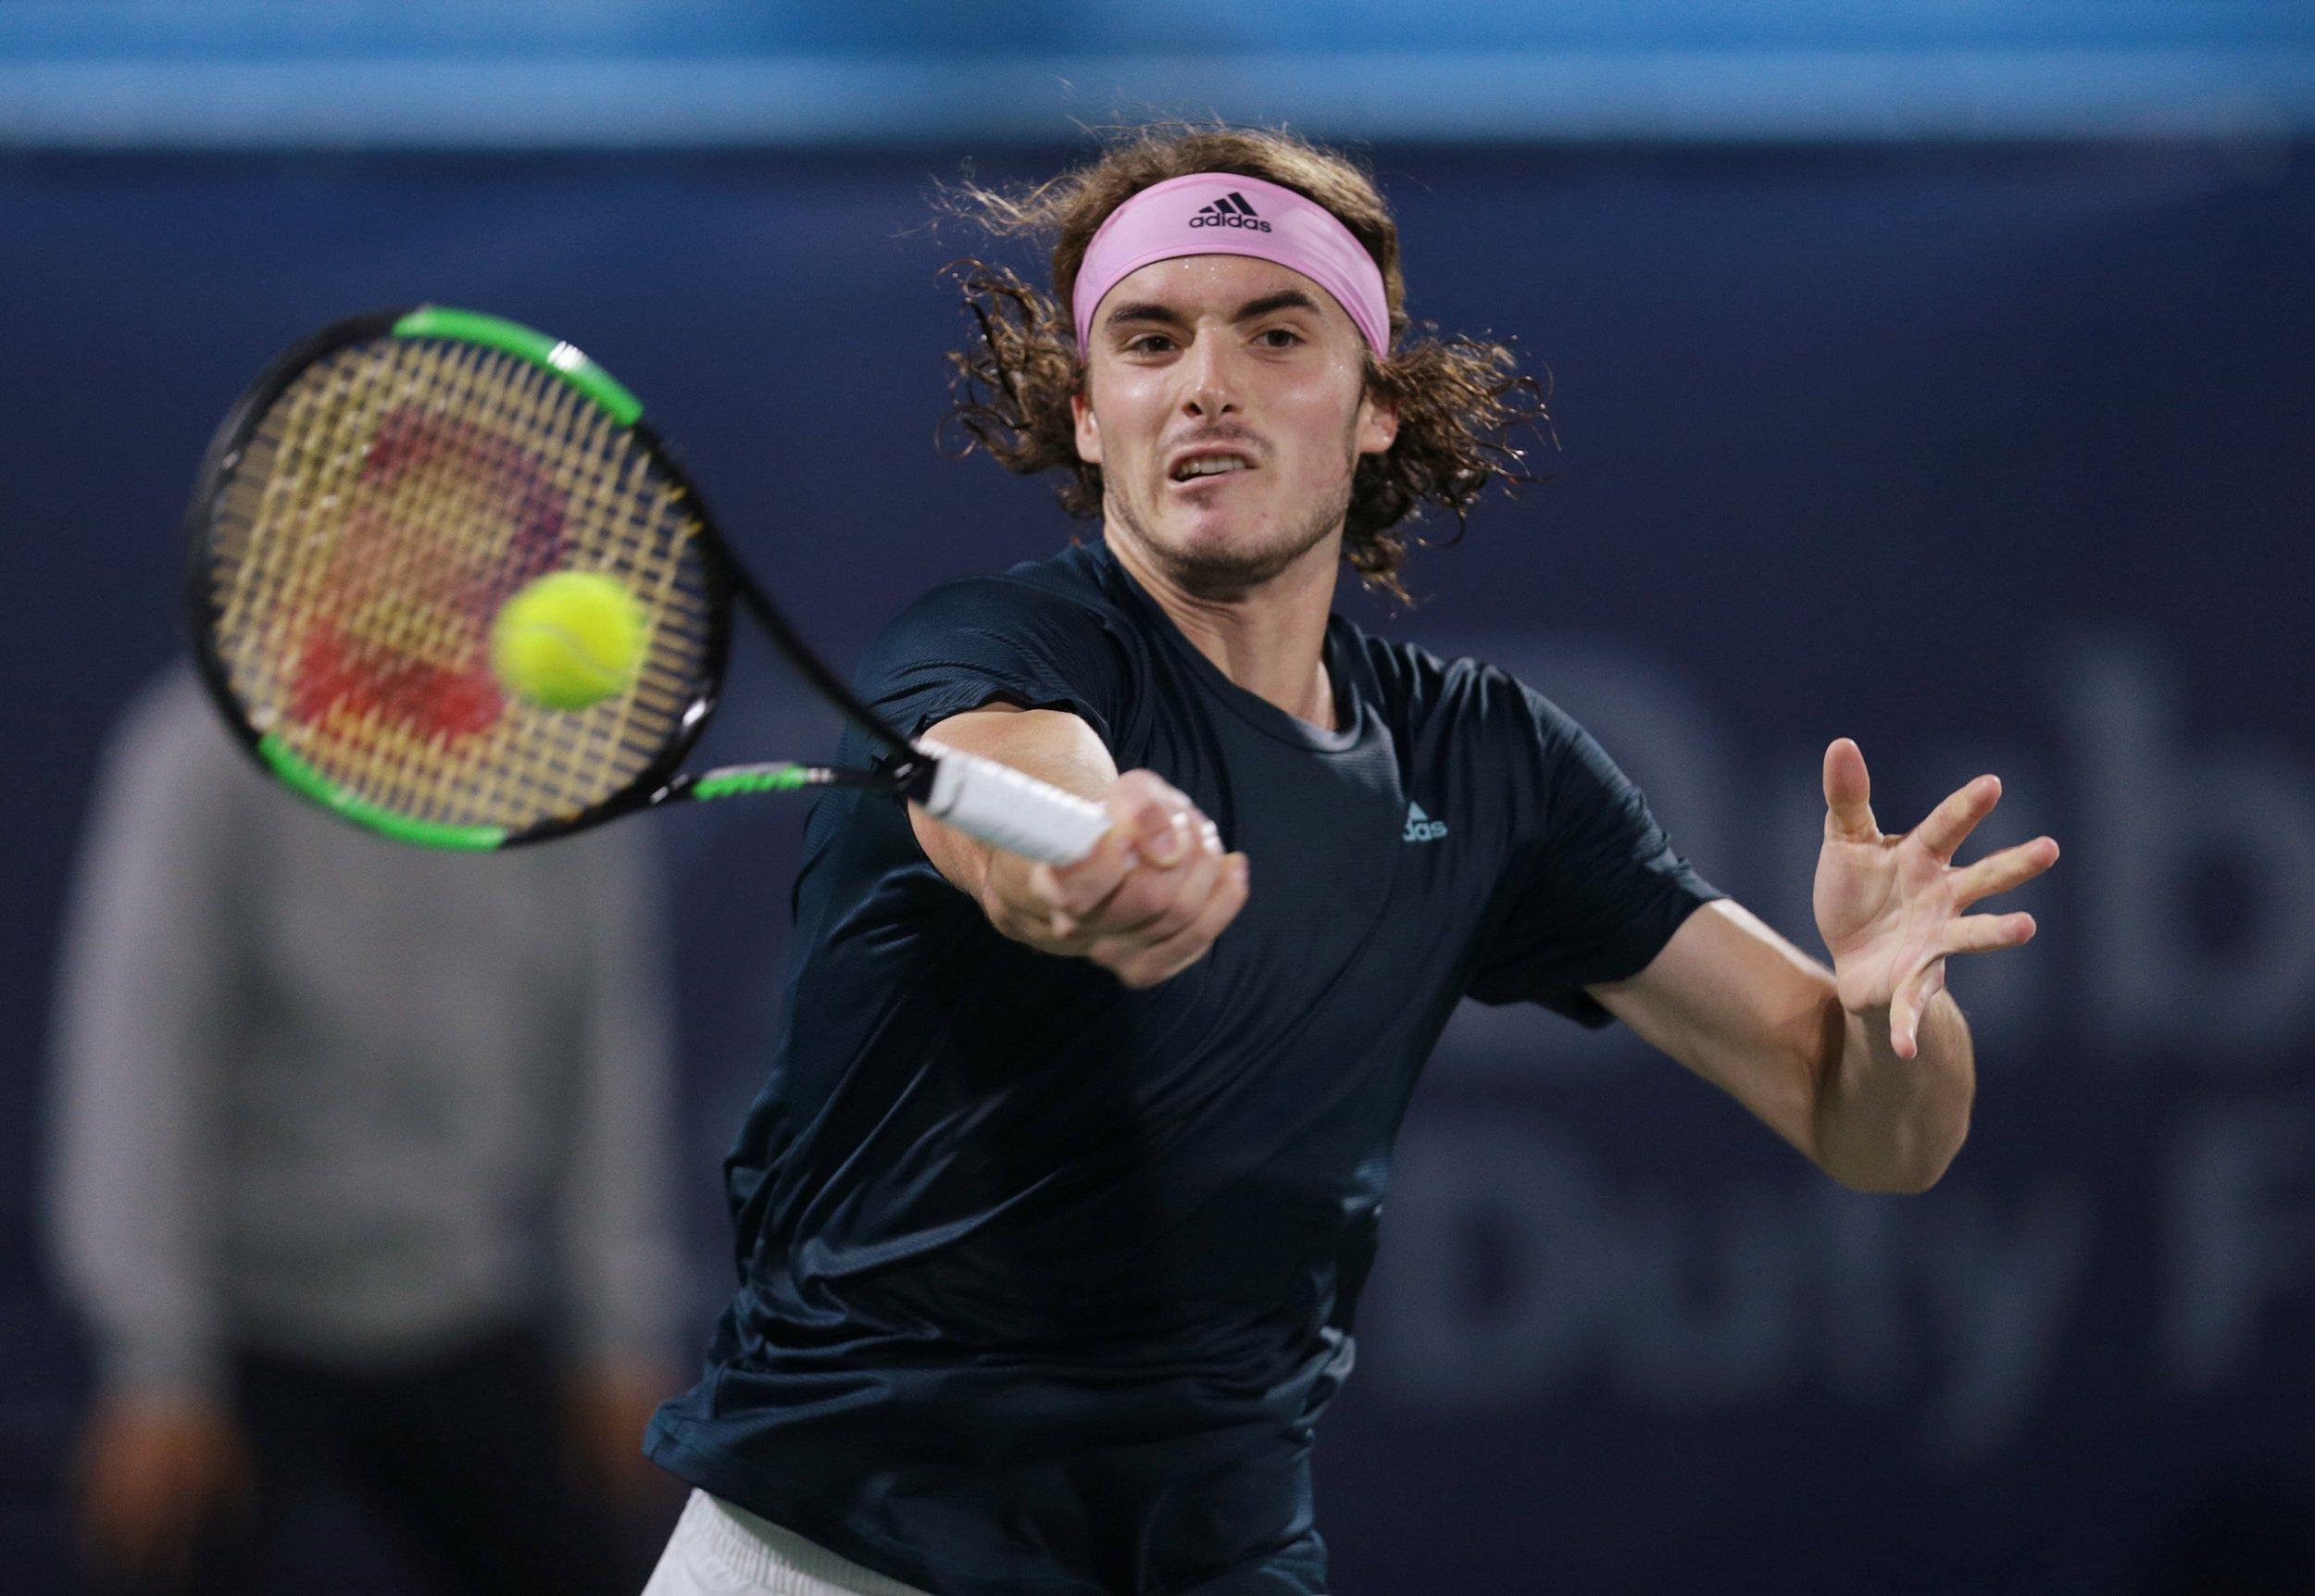 Tennis: Sitasipas defeats Monfils in Dubai championship